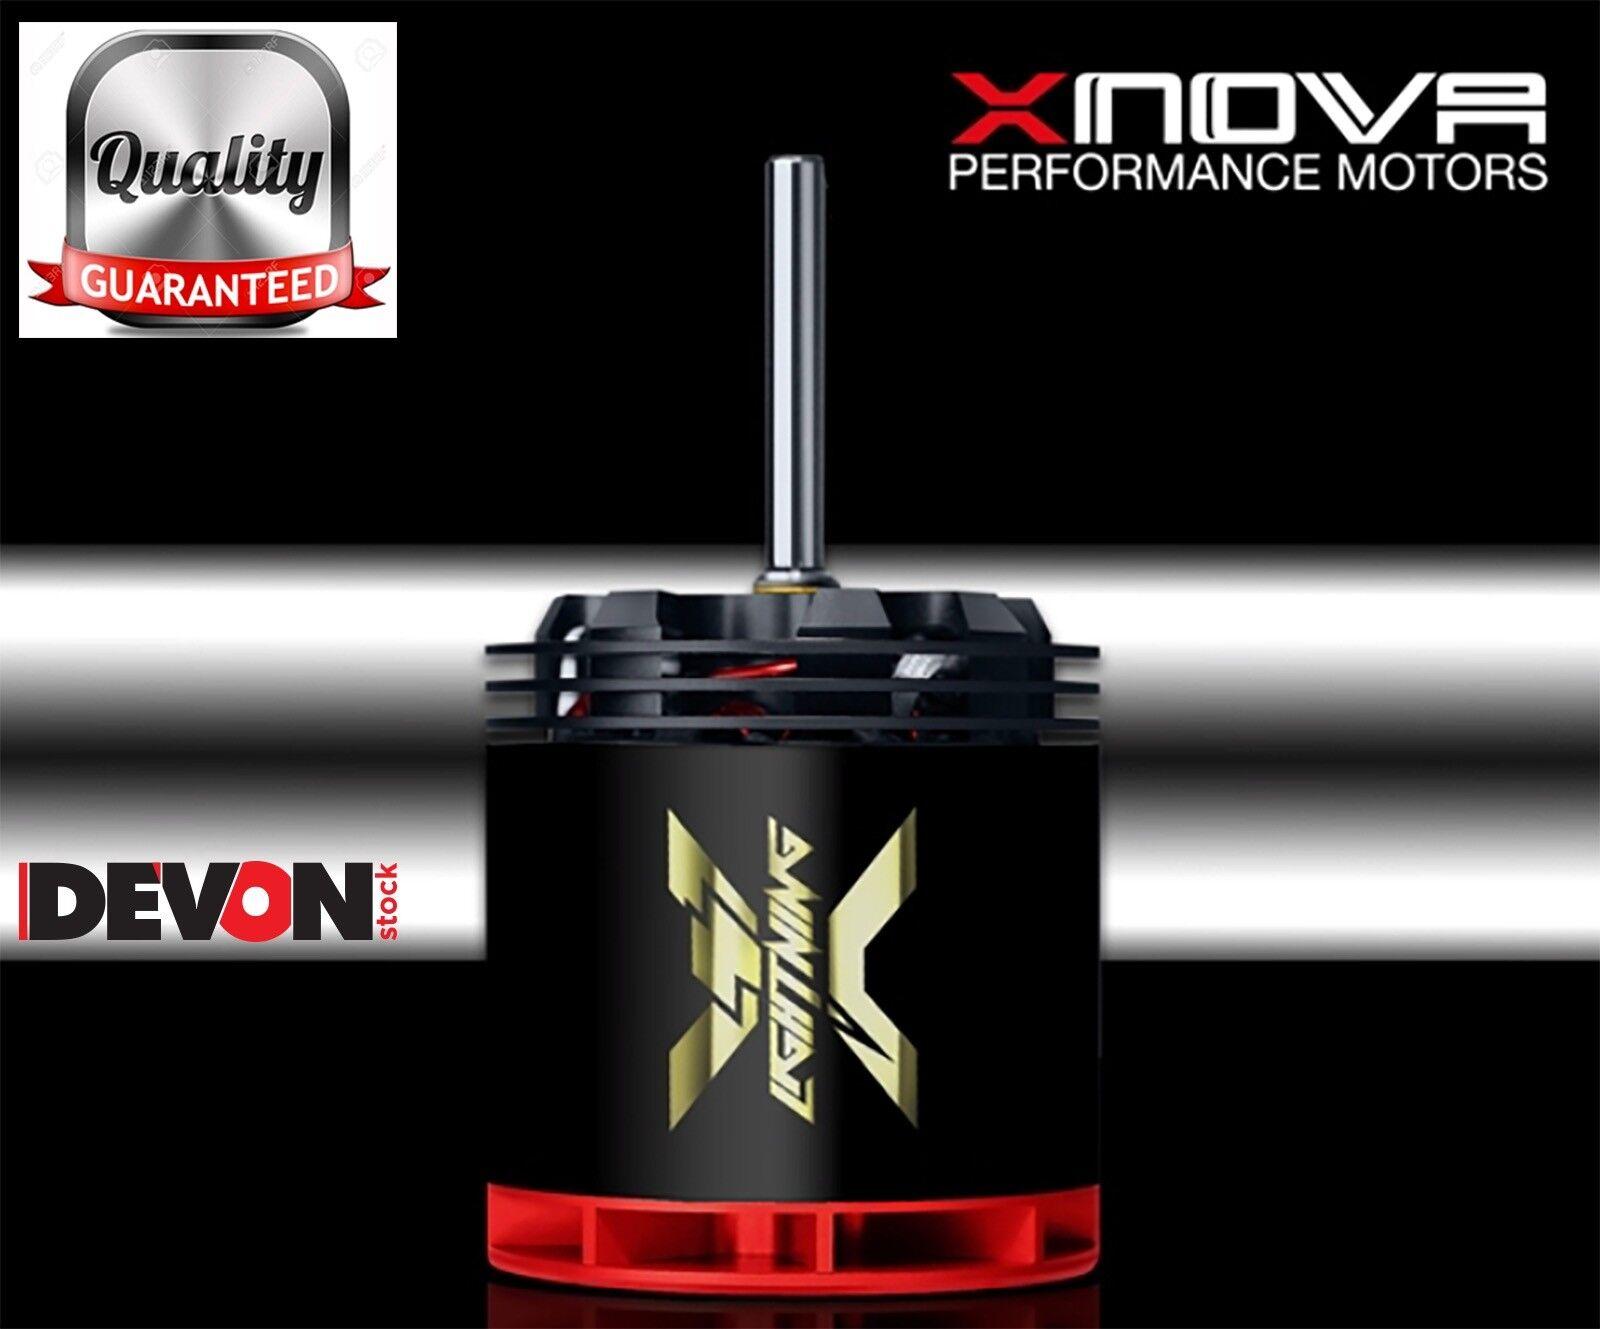 Motore elettrico elicotteri telecomandati Xnova 4530 Lightning 480 Chronos 700